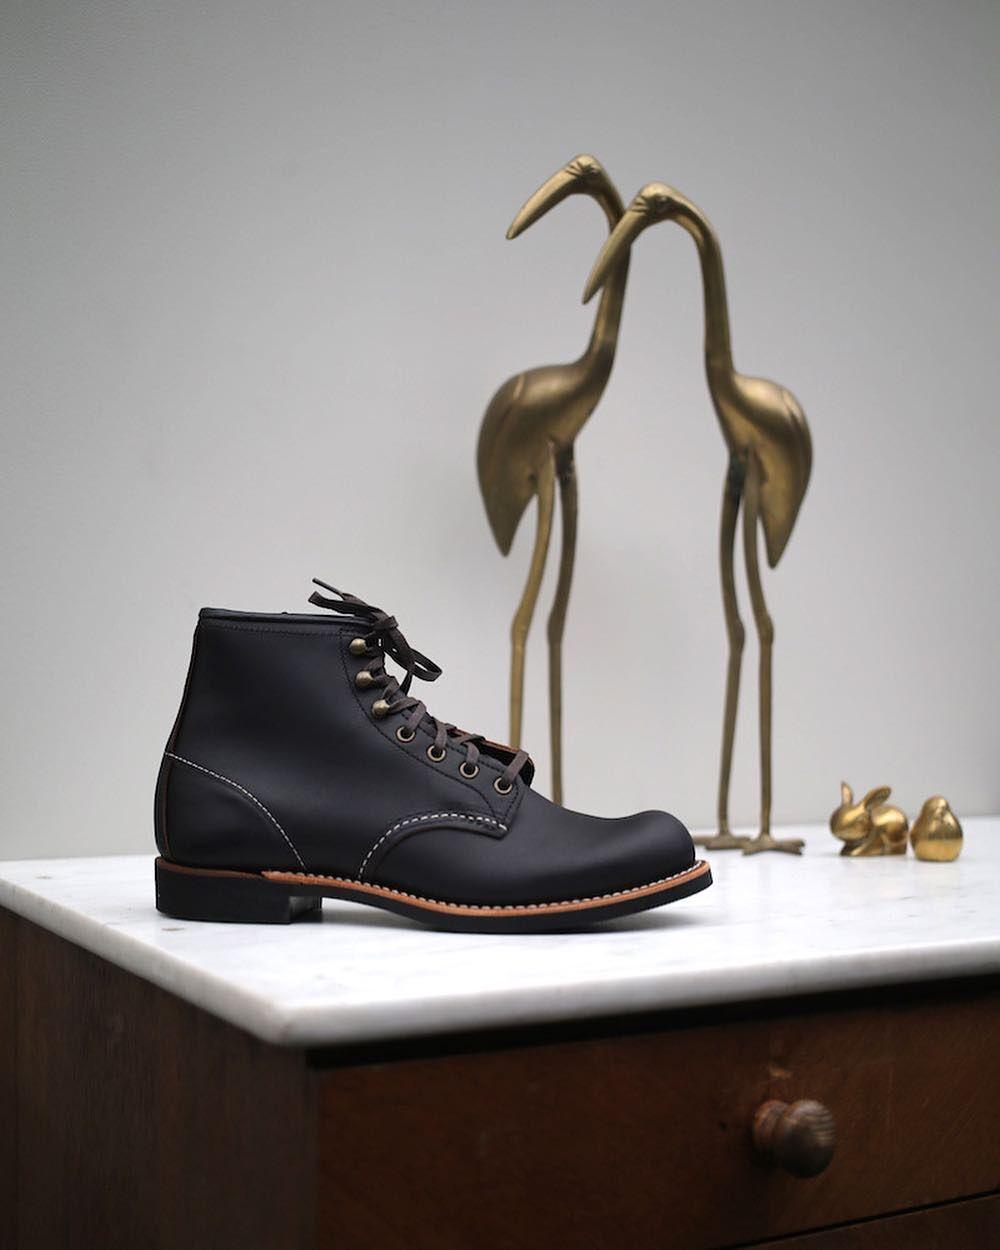 ecc77bba28 FW18 RELEASE - The Blacksmith in Black Prairie. Black Prairie is a similar  leather as